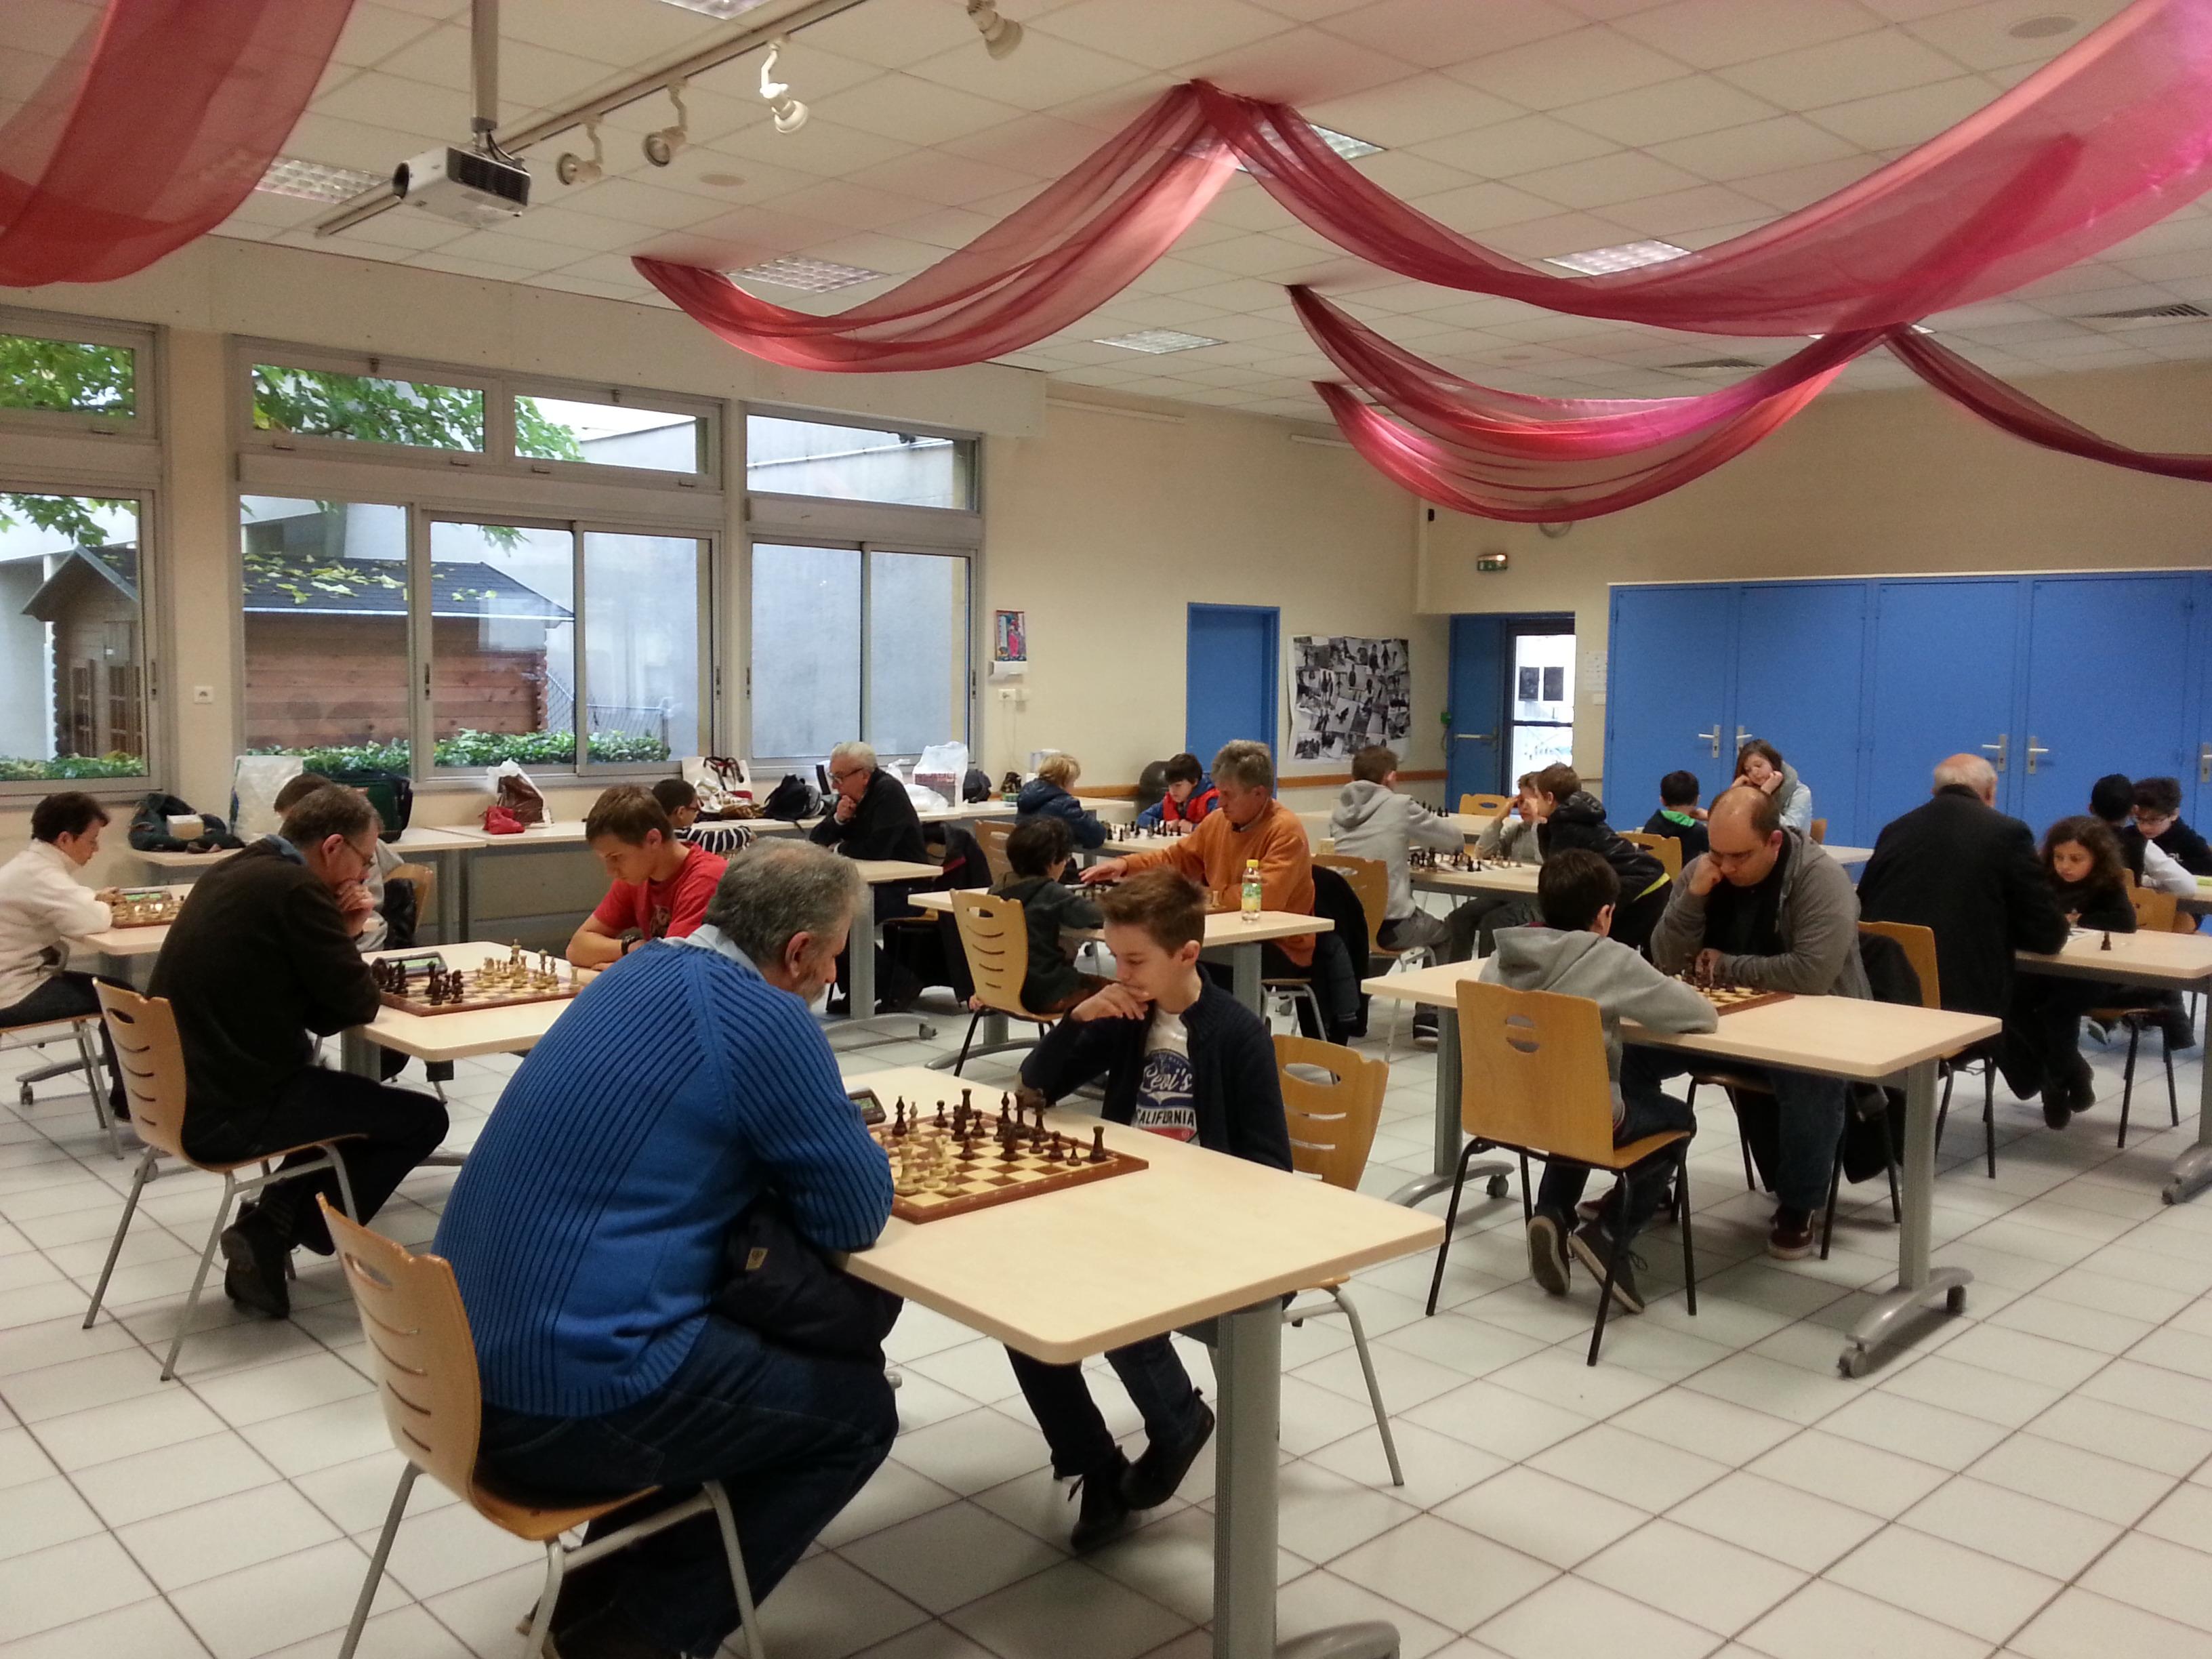 tournoi-interne-6-decembre-2014-academie-echecs-philidor-1